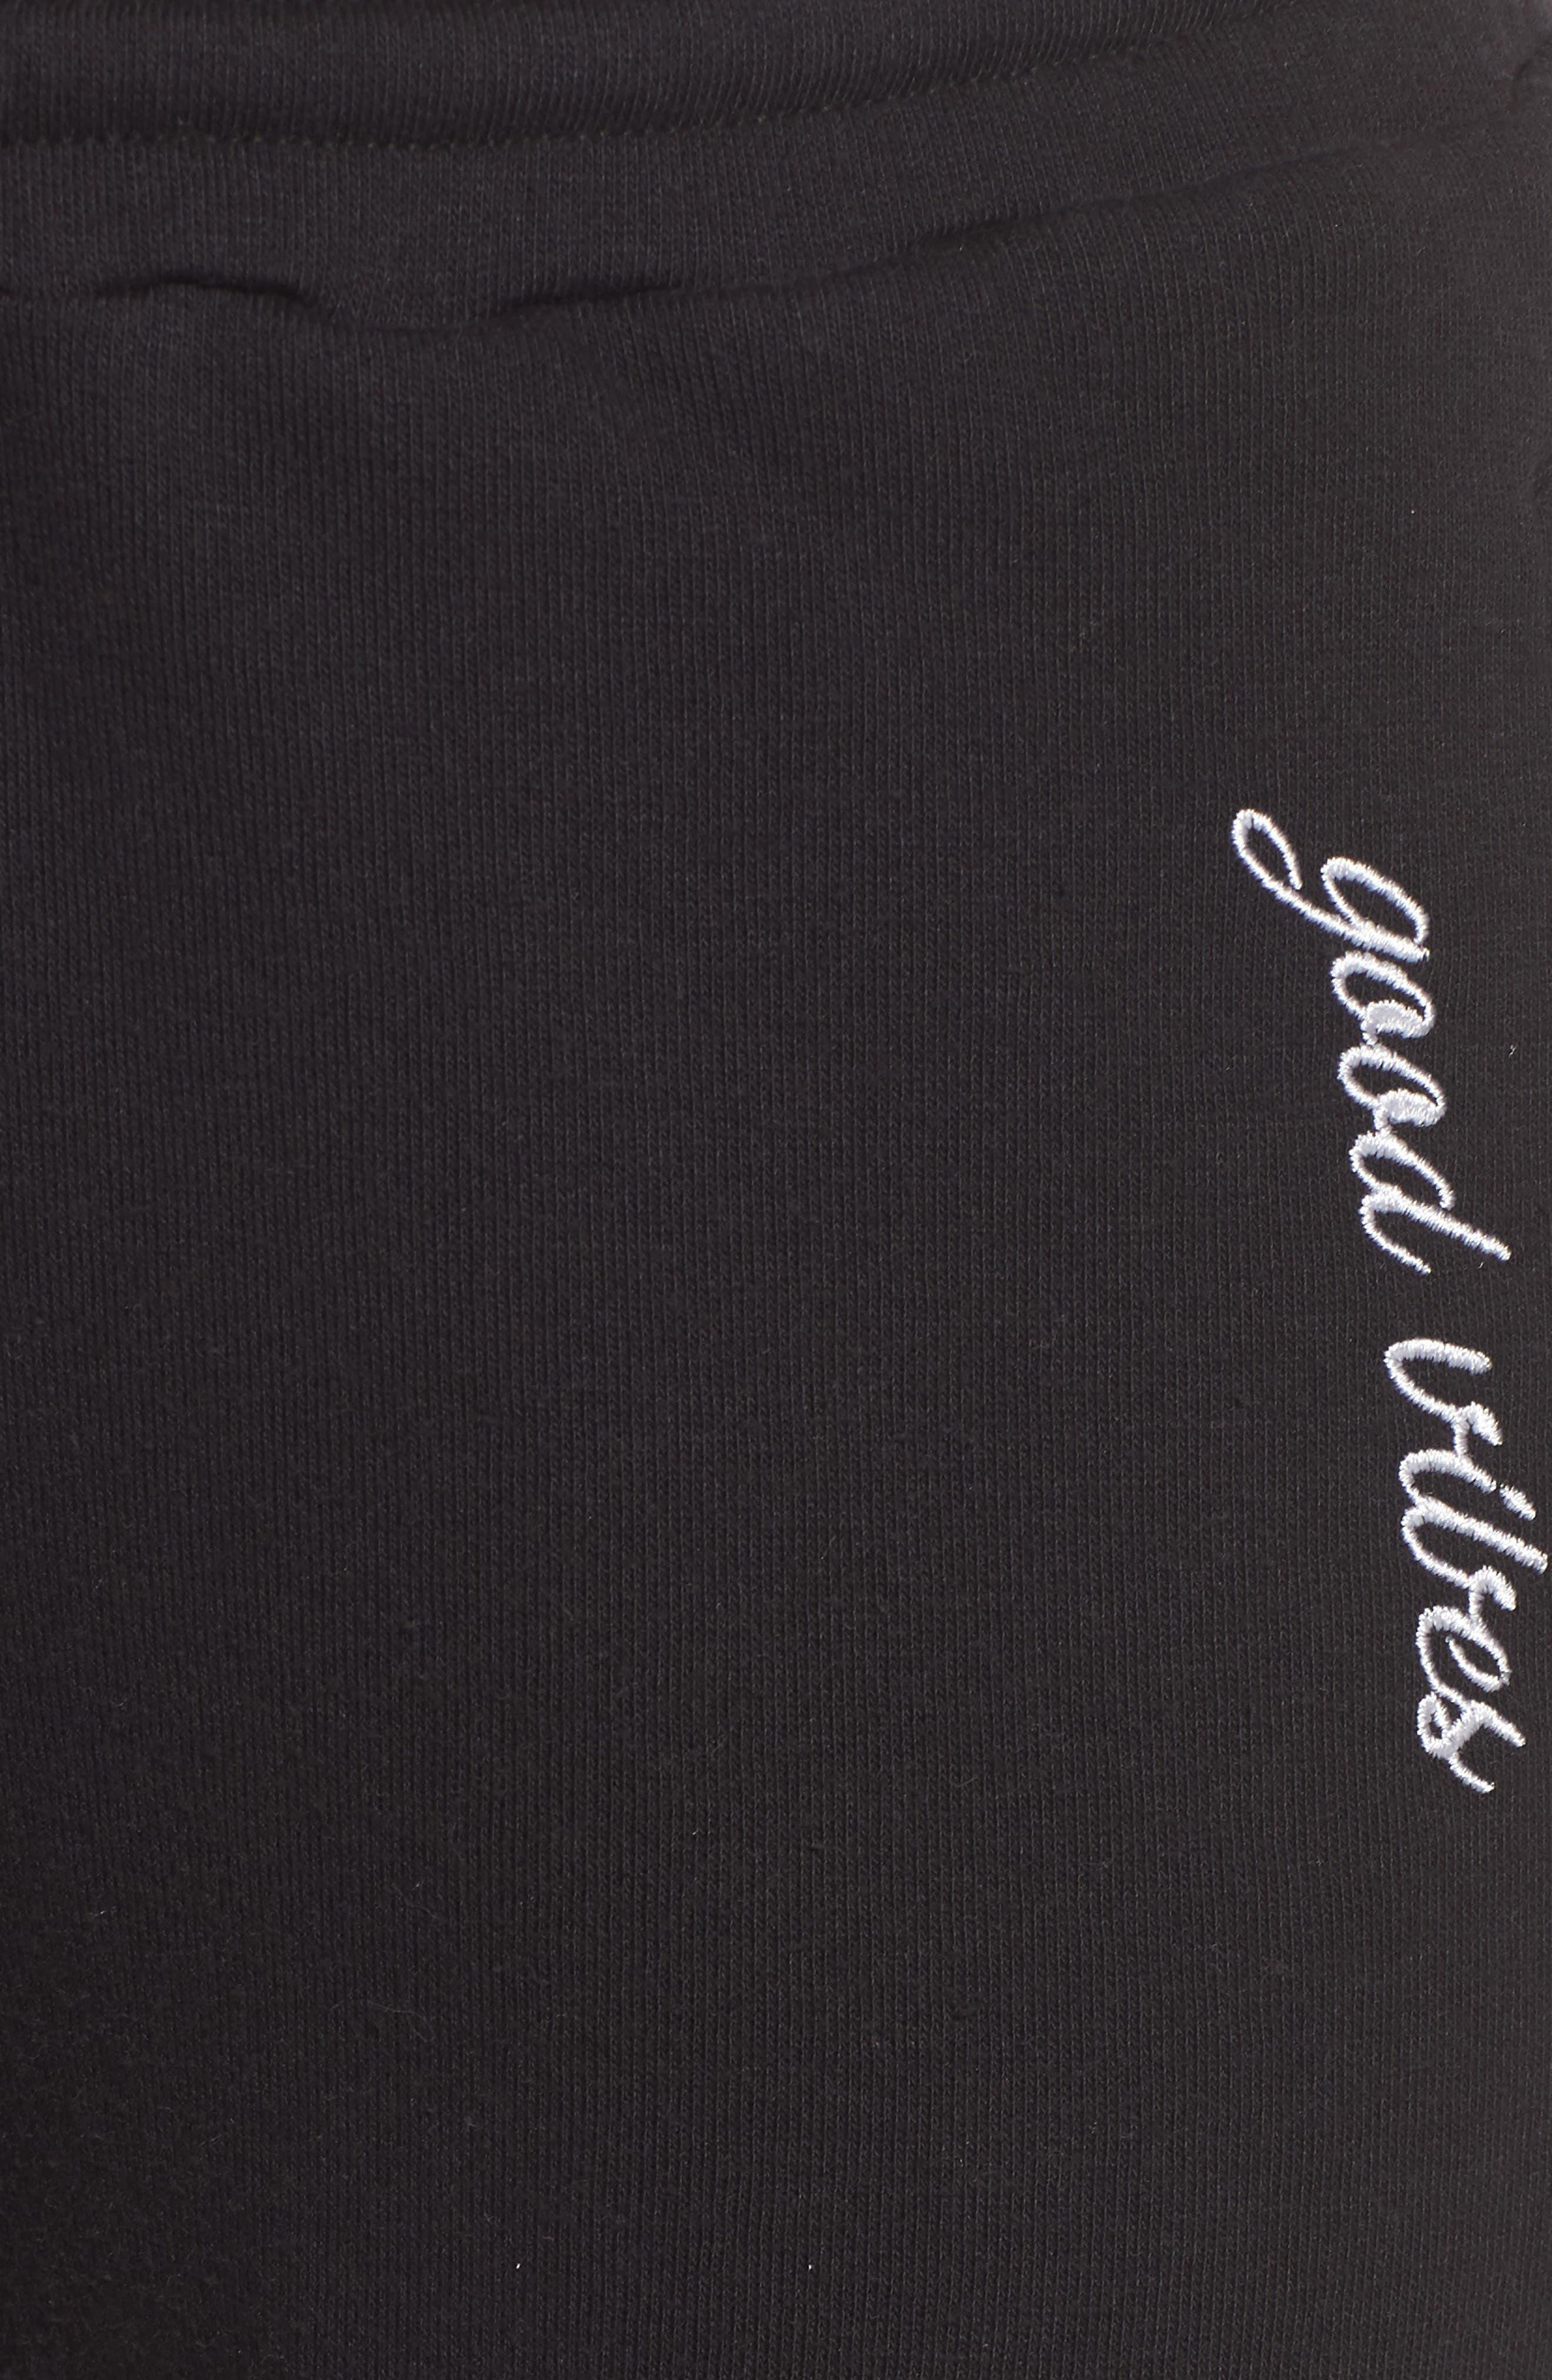 Cambridge Good Vibes Sweatpants,                             Alternate thumbnail 6, color,                             Black